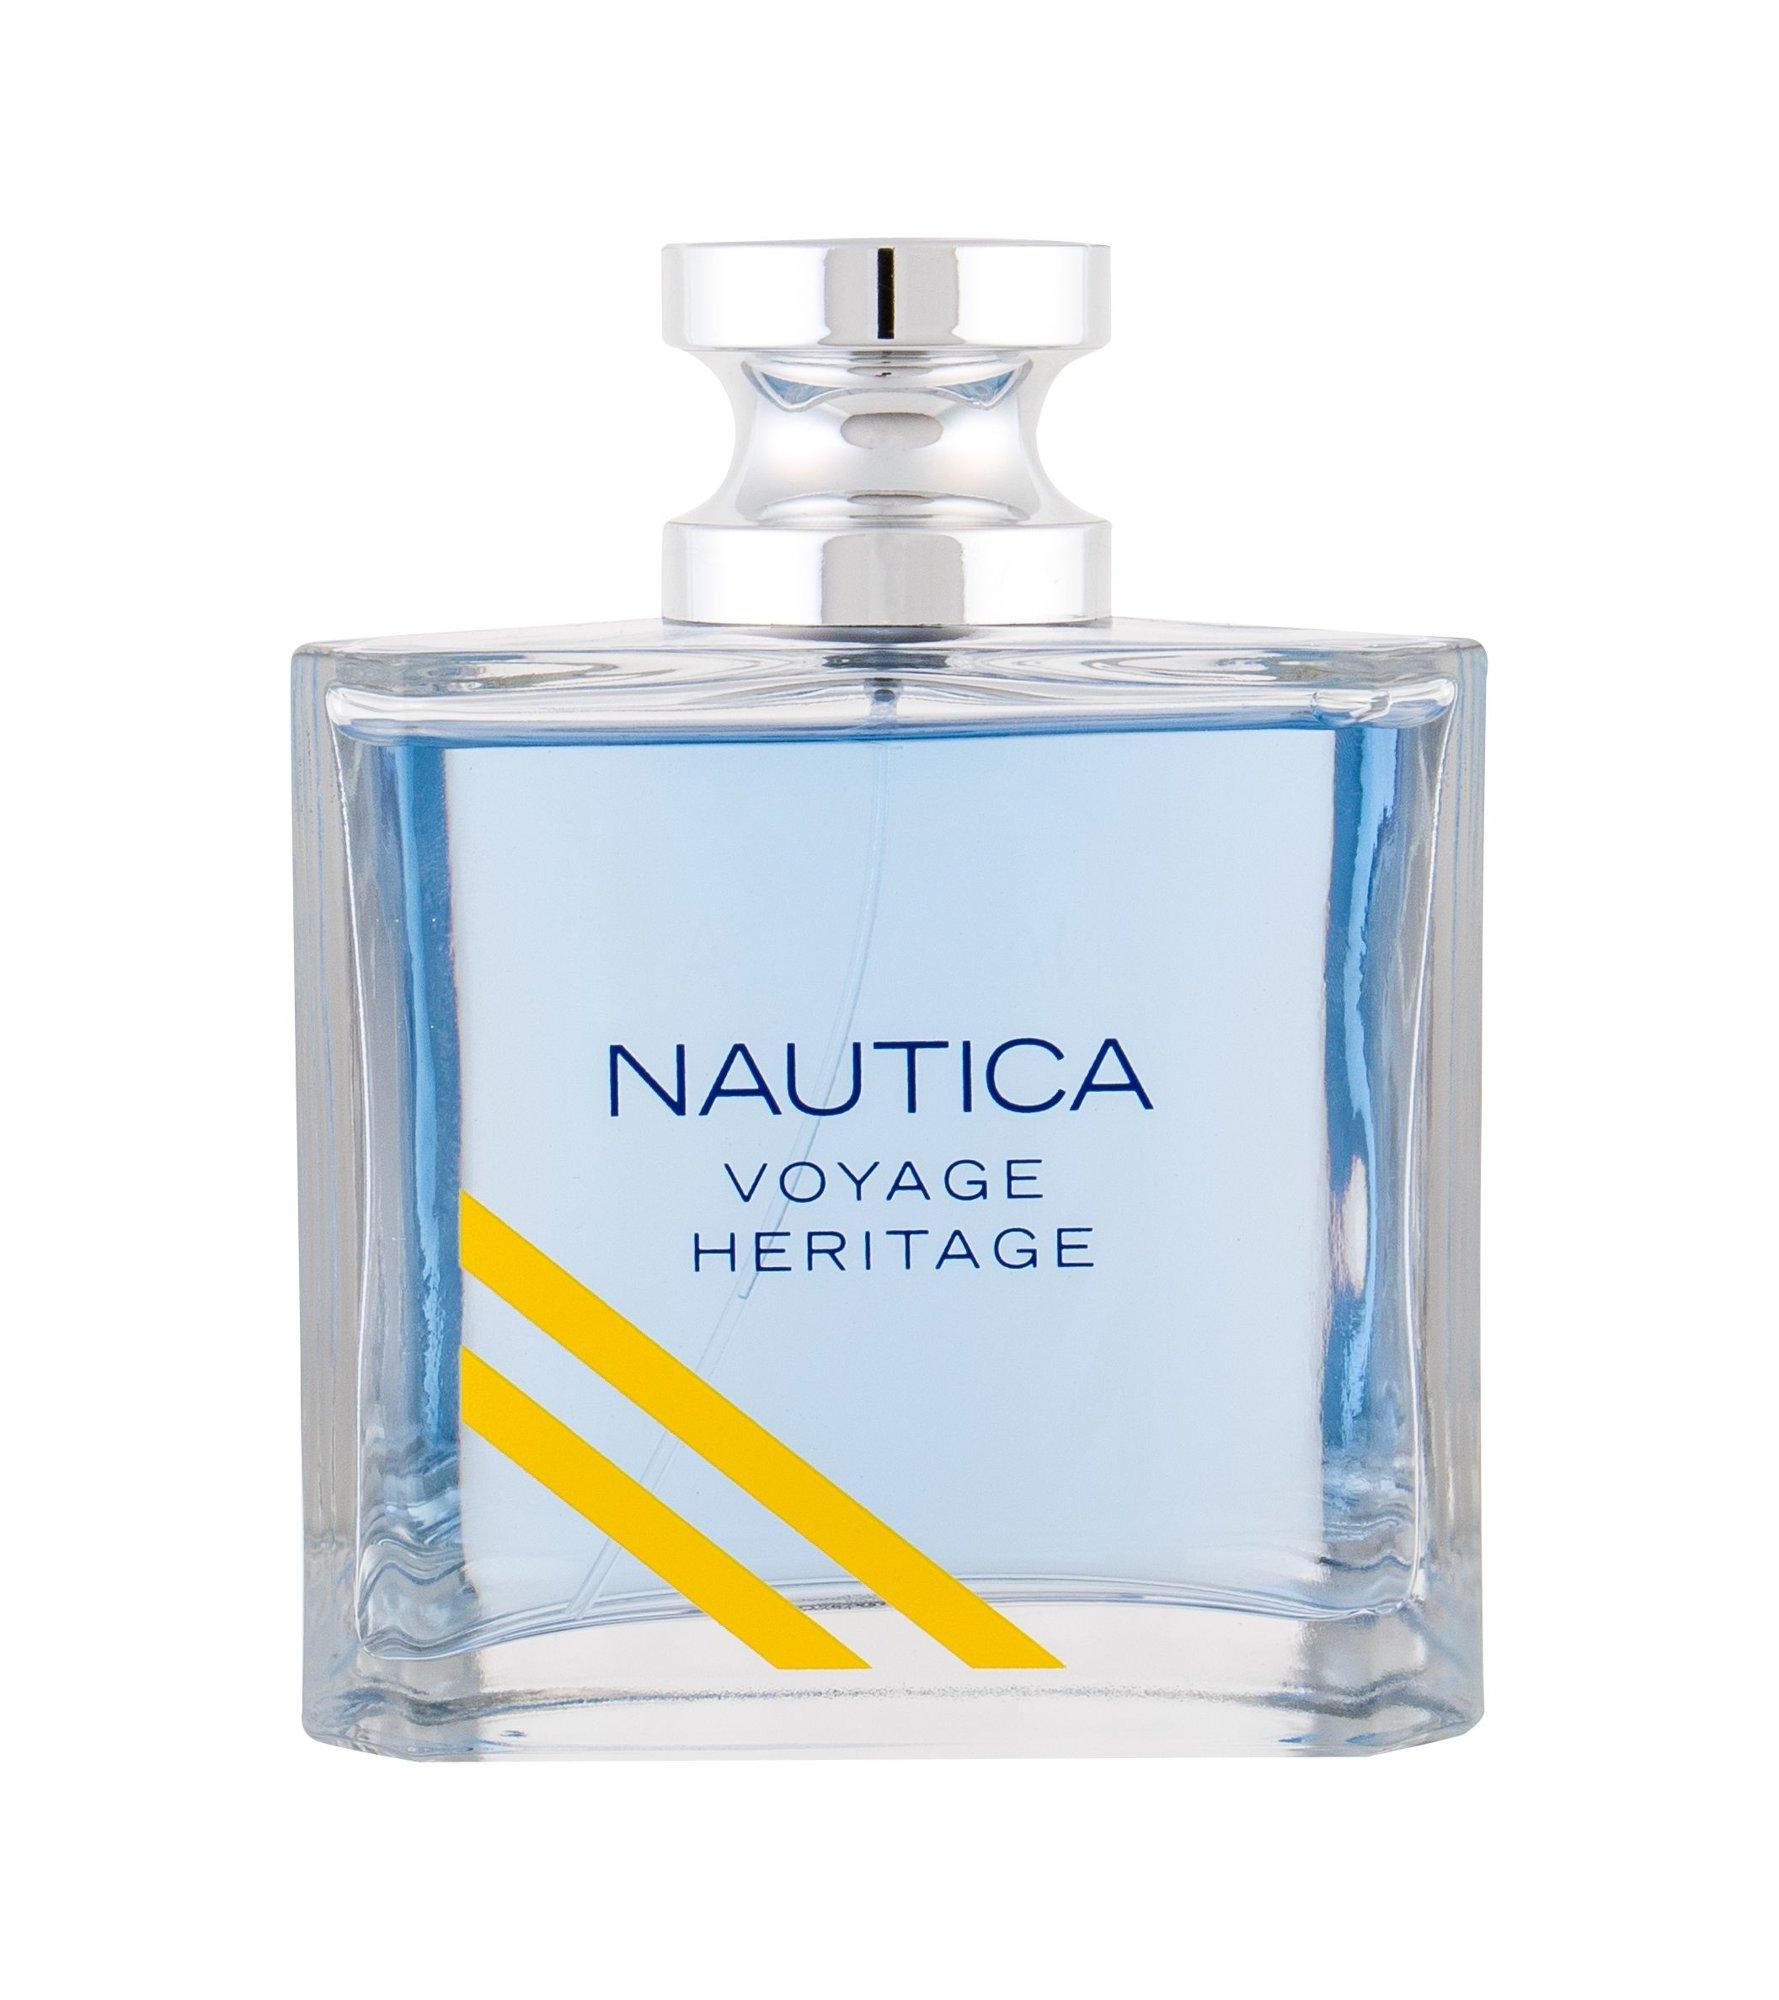 Nautica Voyage Heritage Eau de Toilette 100ml